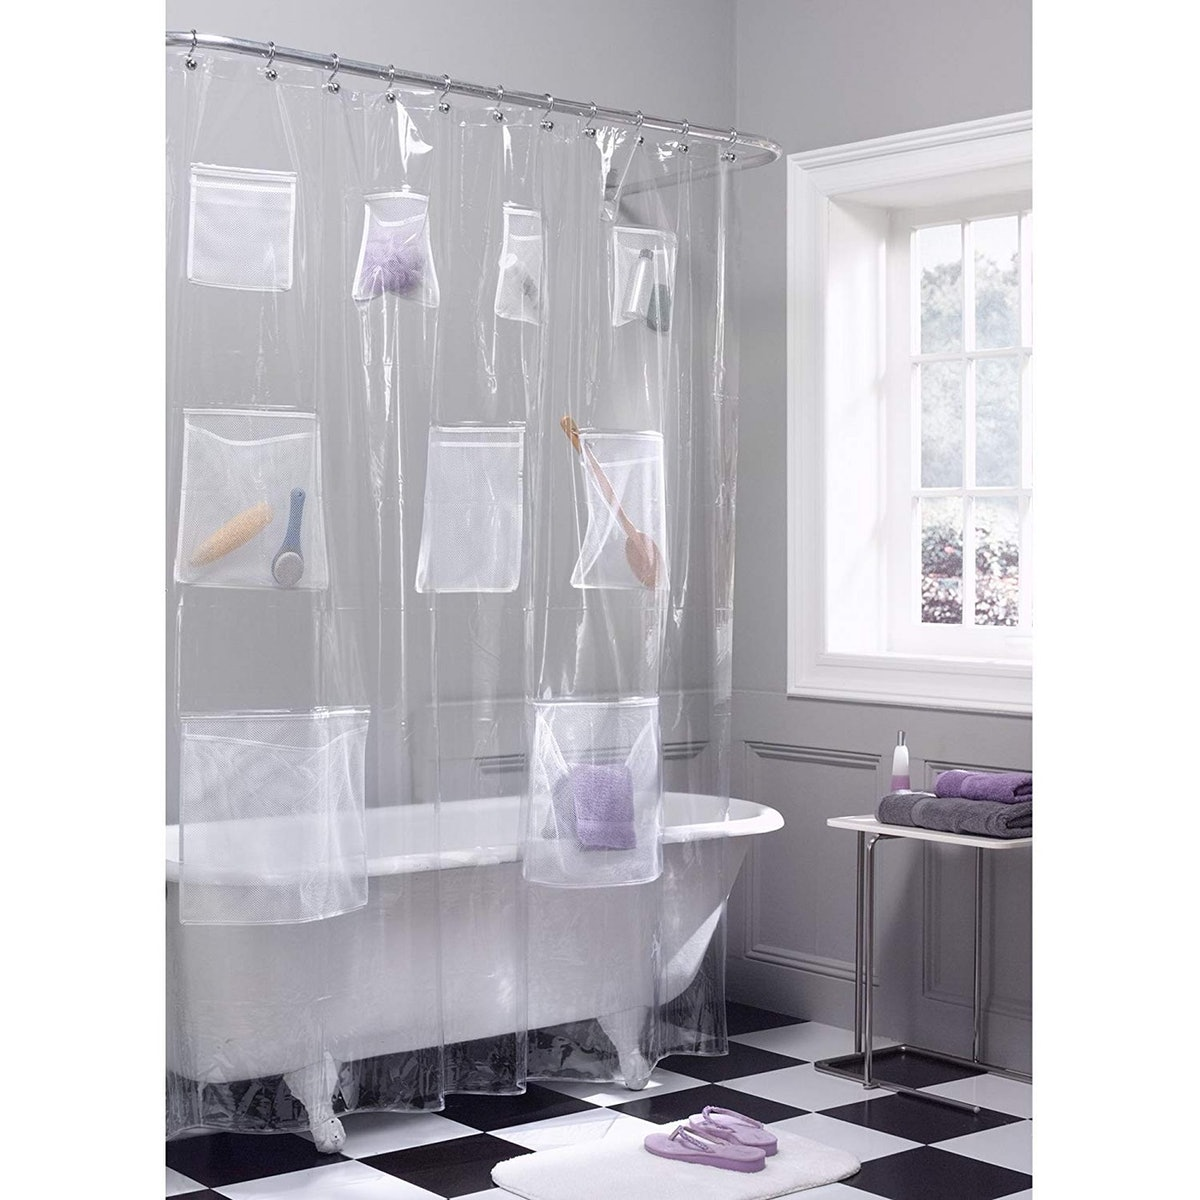 Maytex Quick Dry Mesh Pockets Shower Curtain